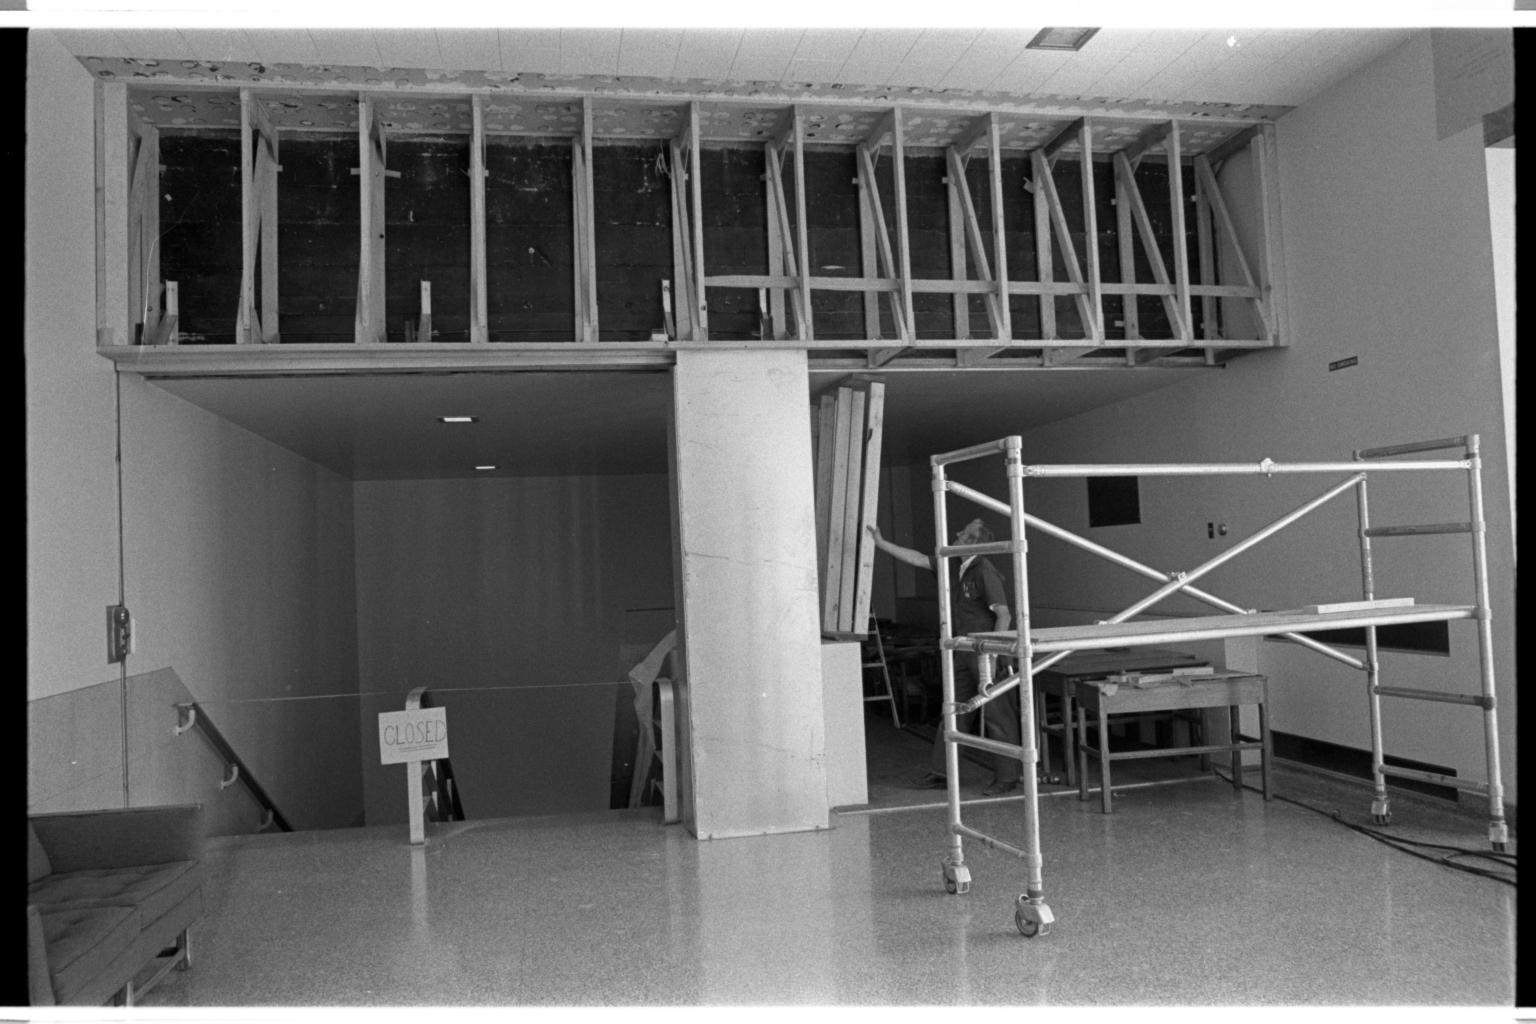 Bailey Lounge Construction